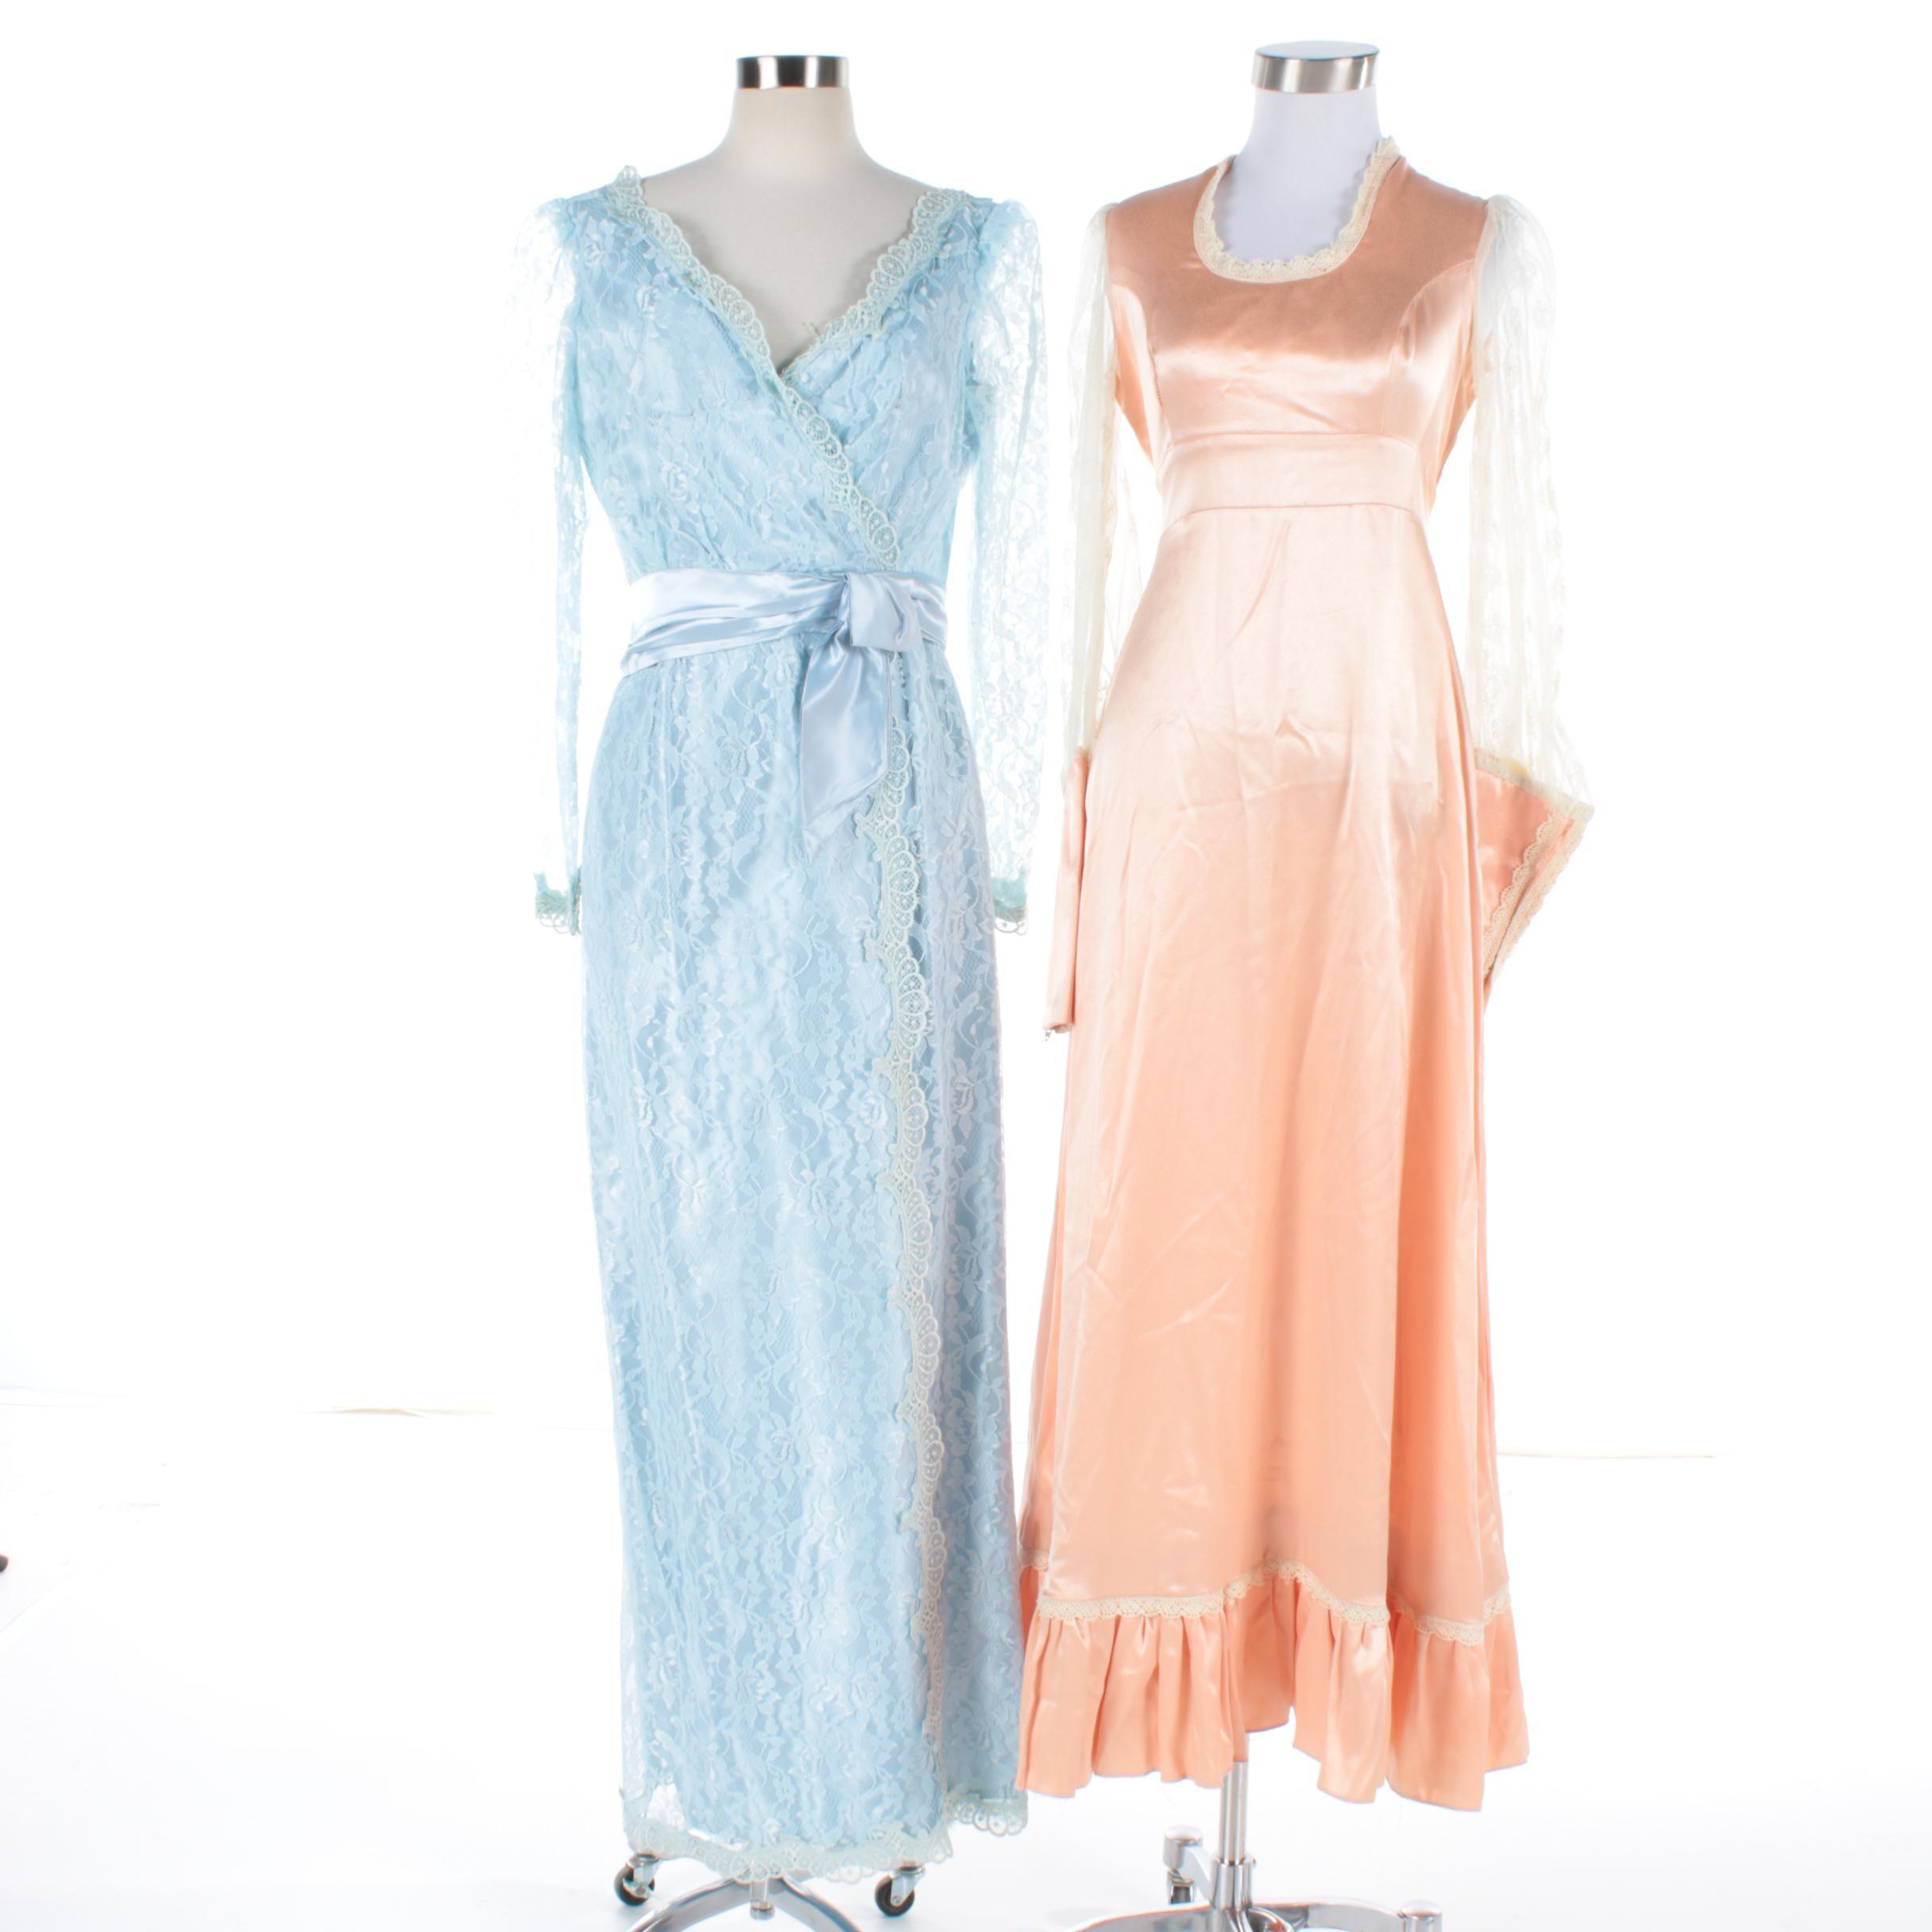 Vintage Lace and Satin Formal Dresses